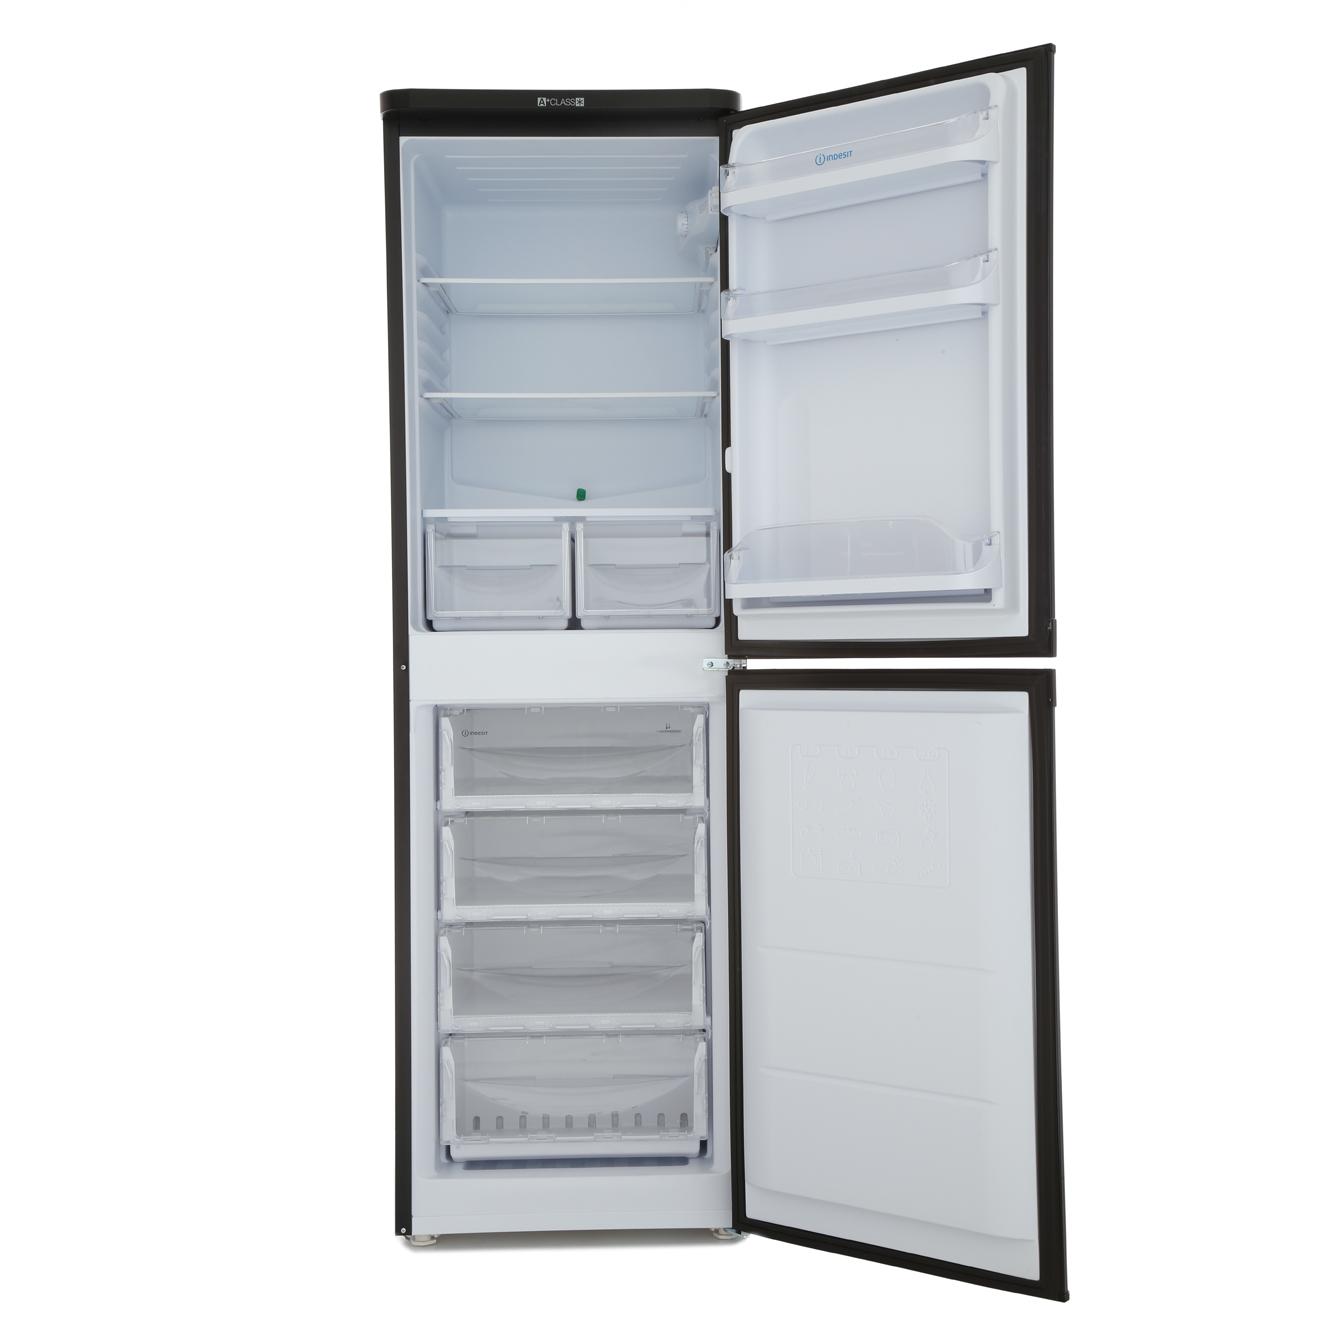 Buy Indesit Caa55k Fridge Freezer Caa55kuk Black